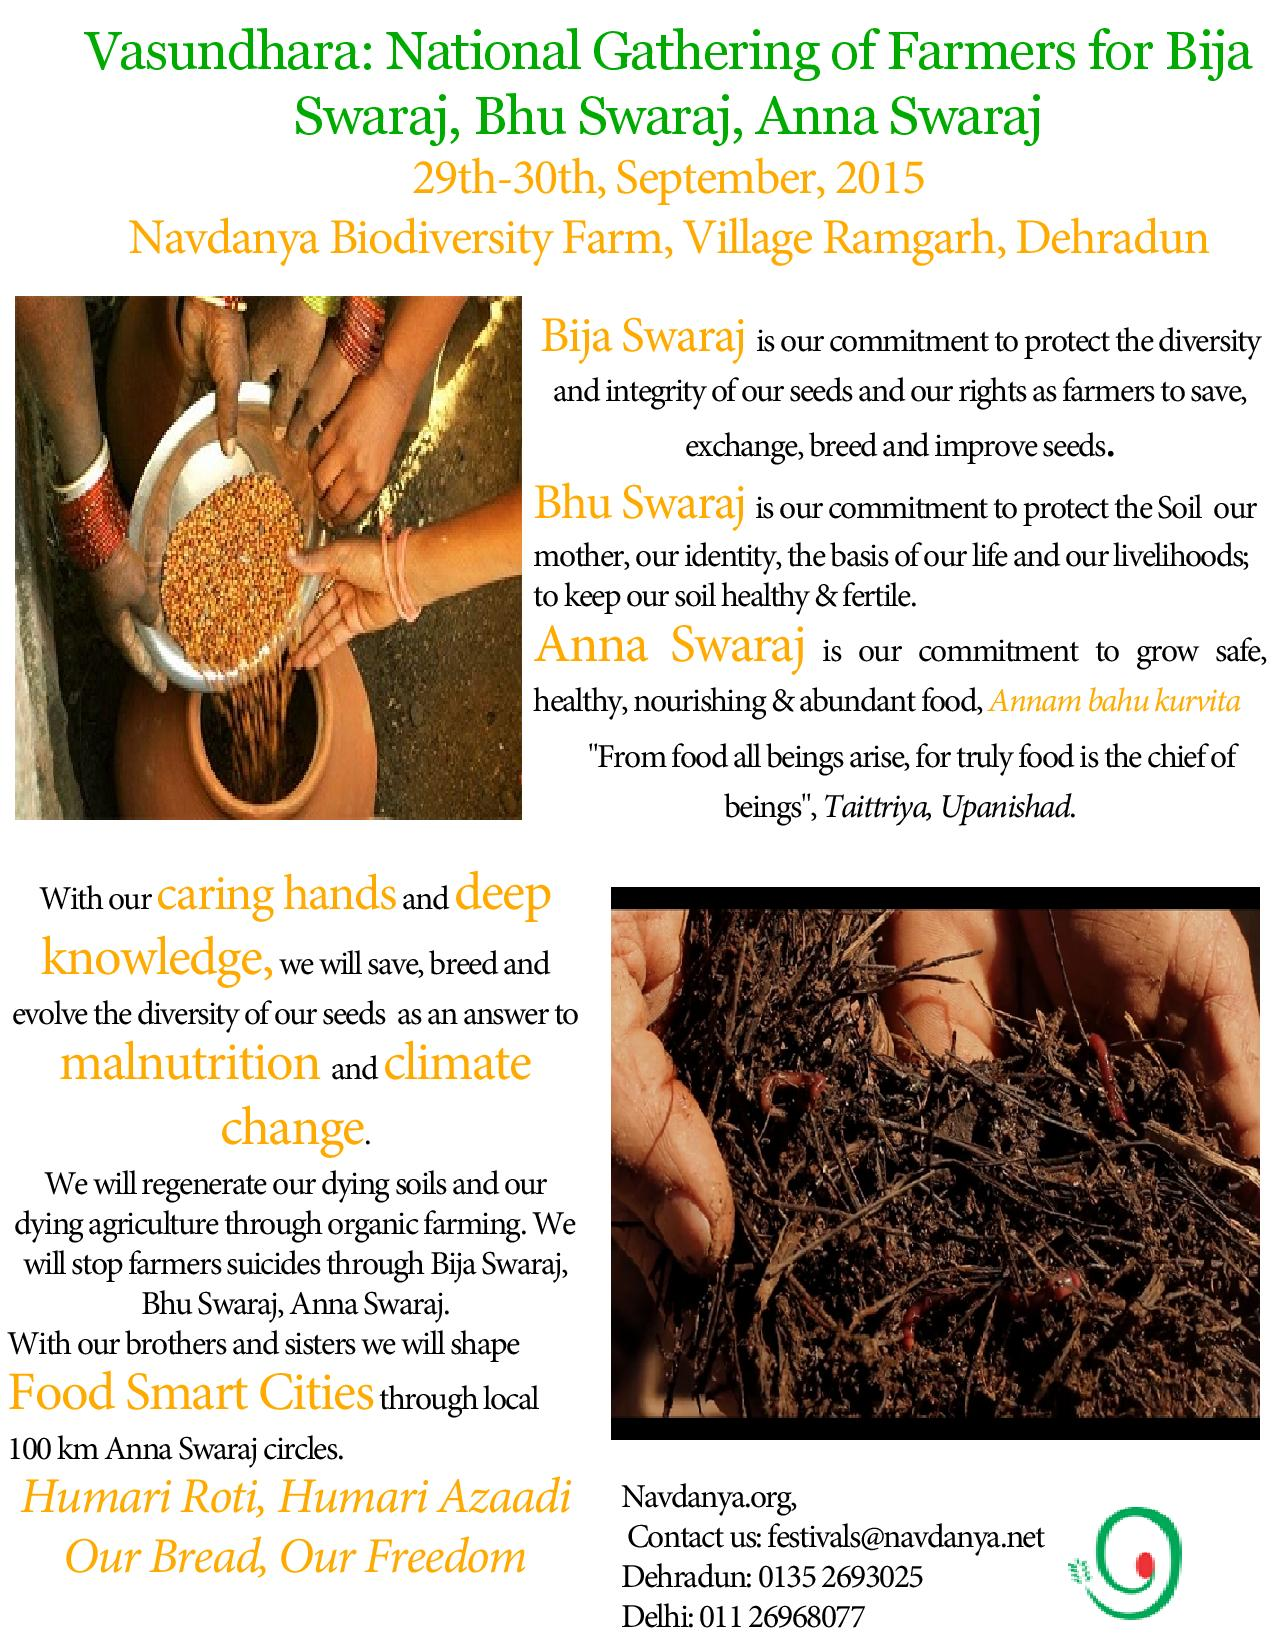 Vasundhara: National Gathering of Farmers